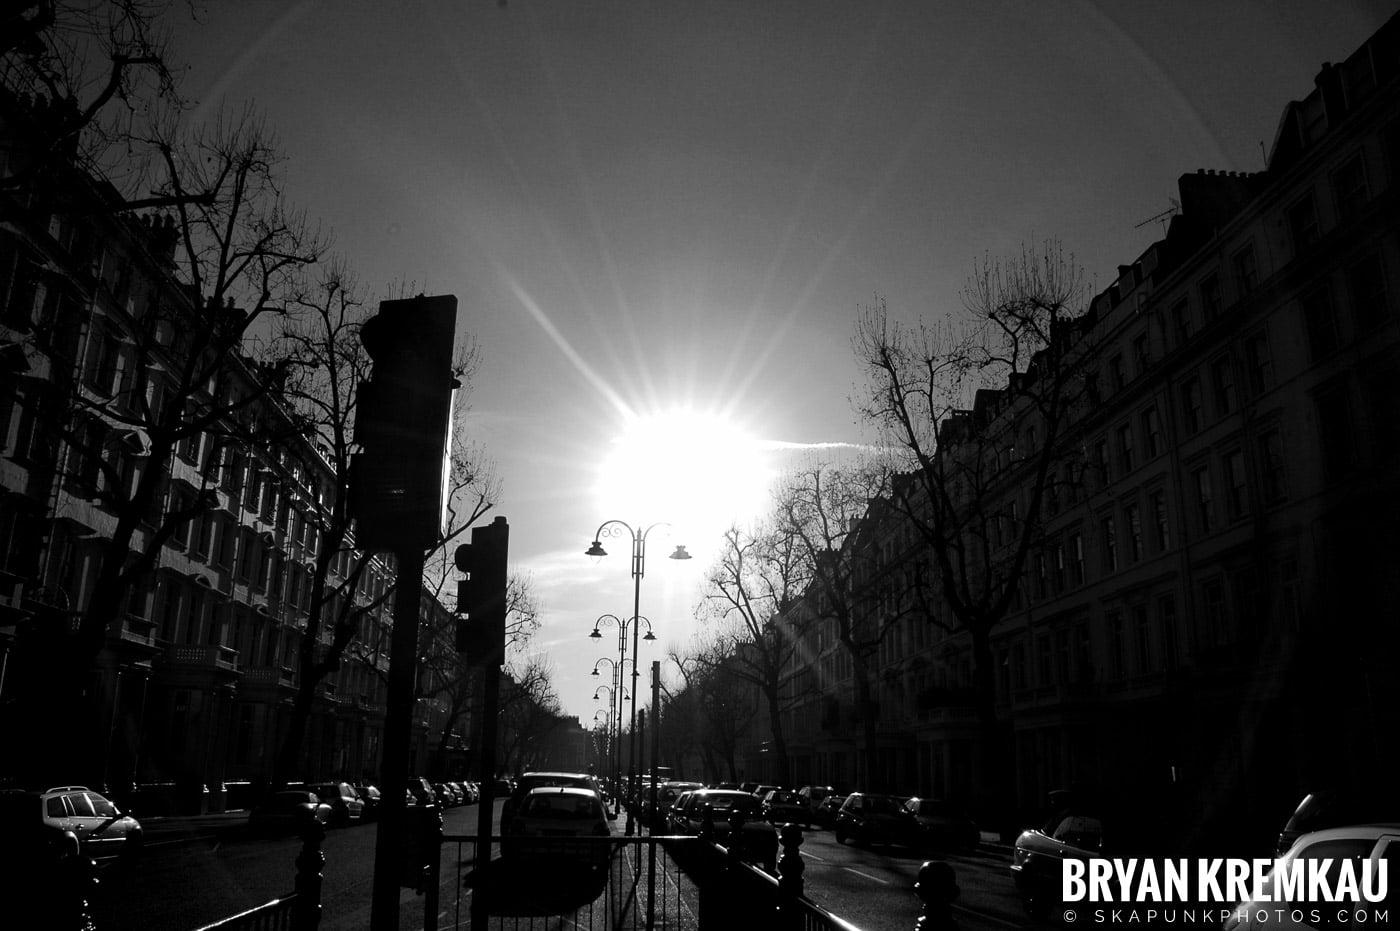 London, England - Day 3 - 12.18.05 (42)